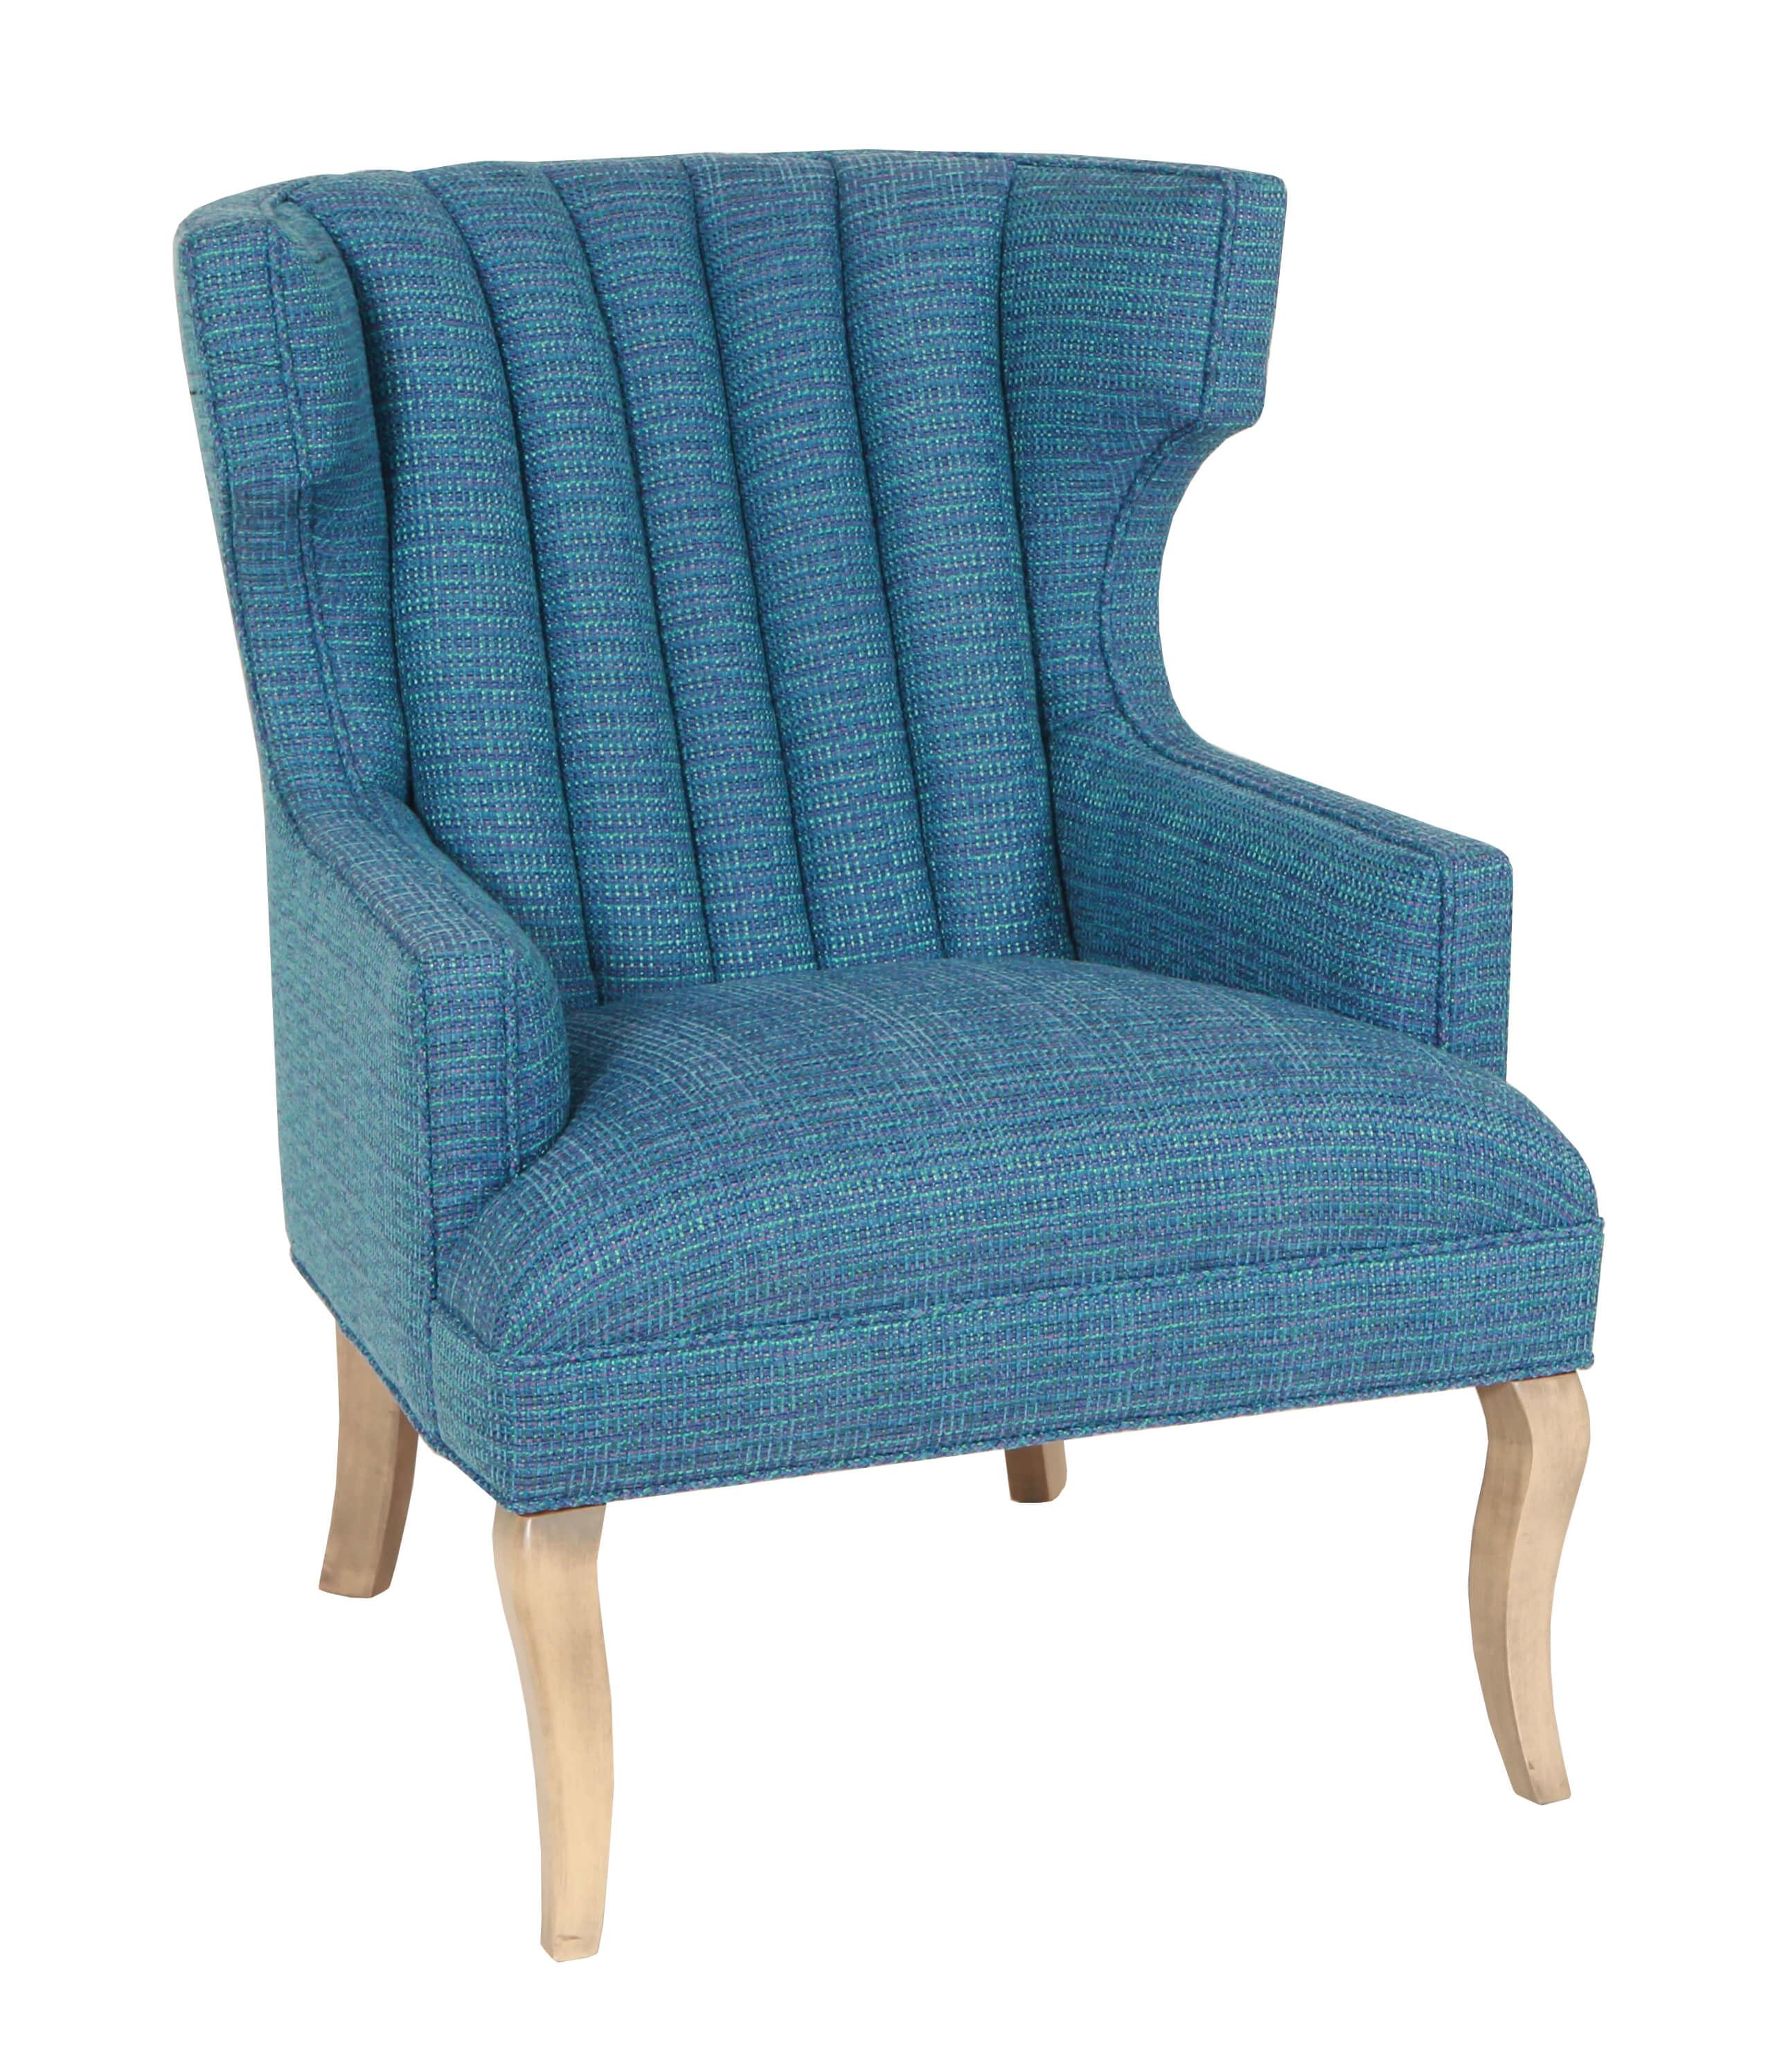 Doris_Chair_Eclectic Collector